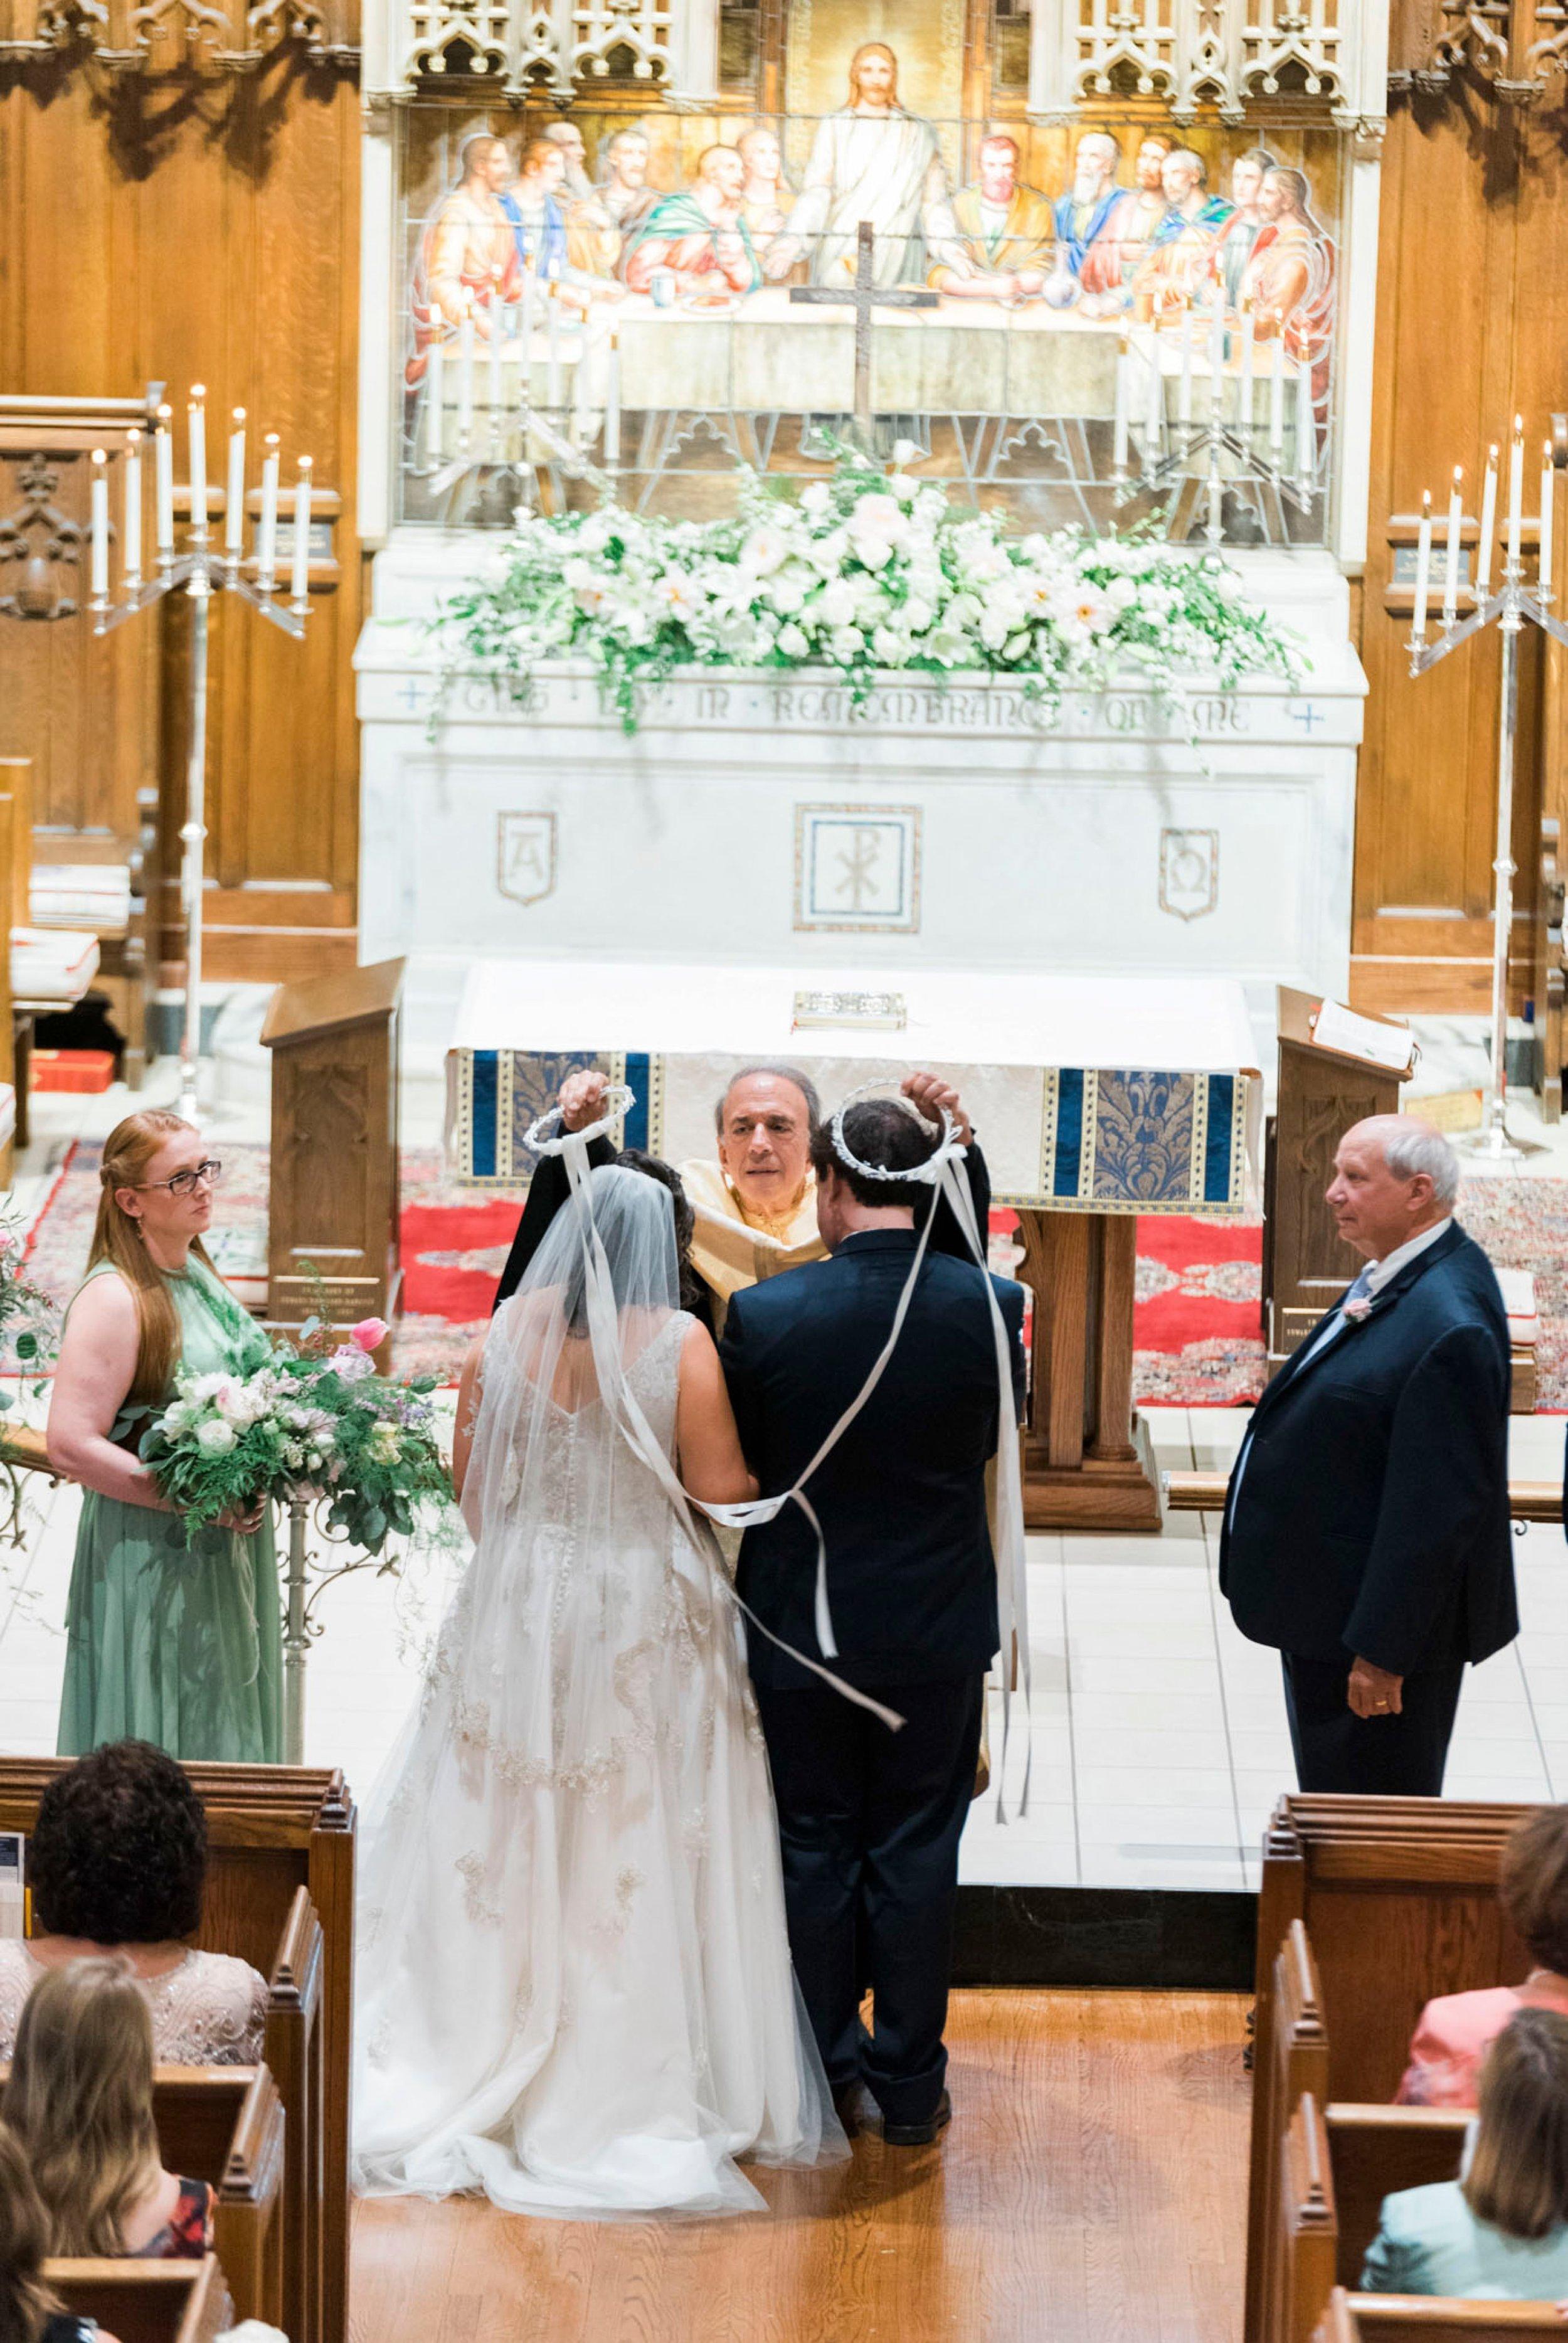 TheVirginianHotel_LynchburgVA_TheVirginianHotelWedding_Virginiaweddingphotographer_Lynchburgvawedding 31.jpg